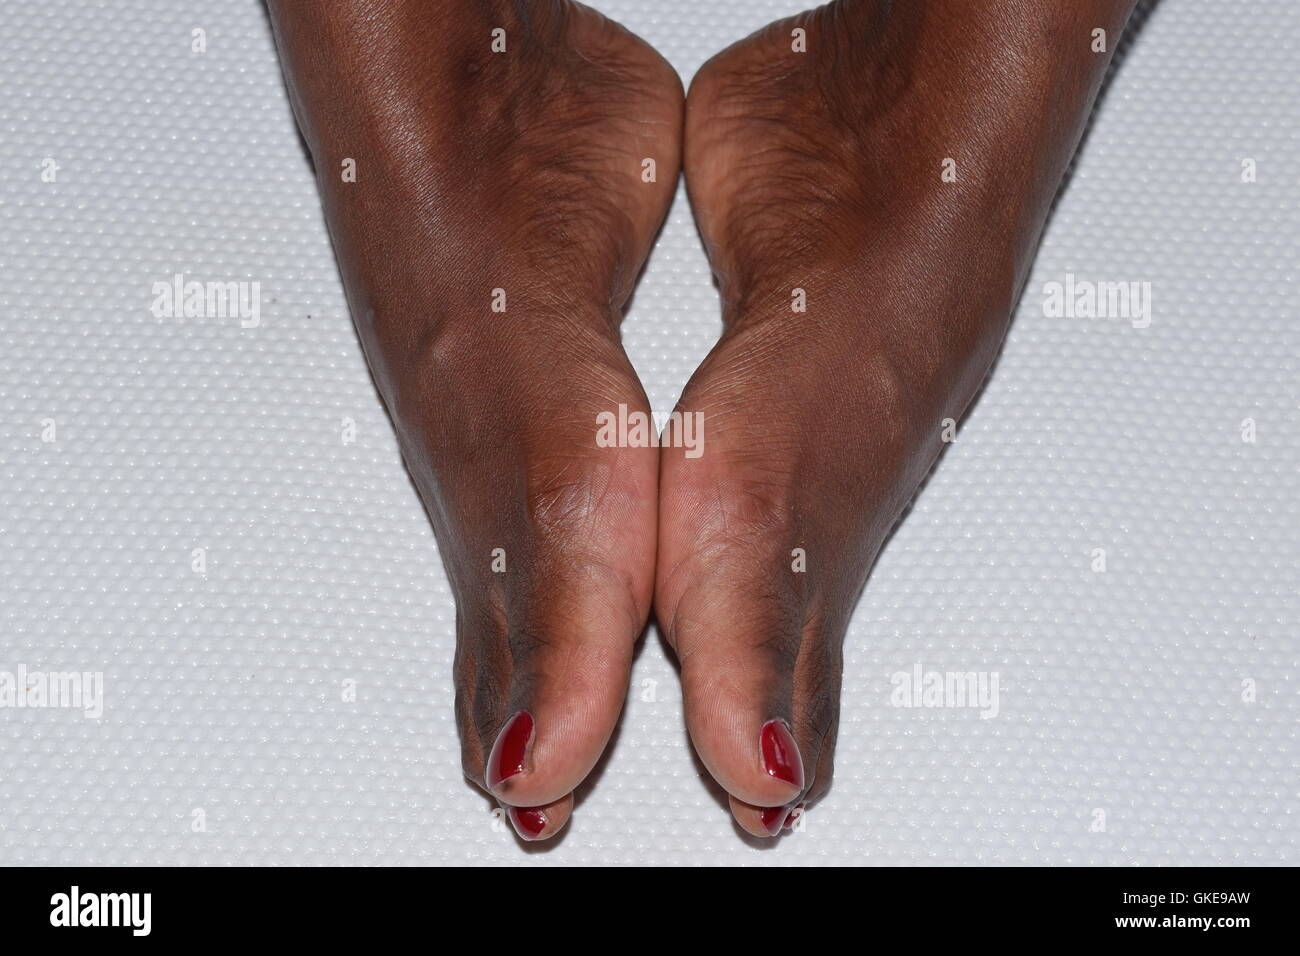 Black Female's Feet Together - Stock Image